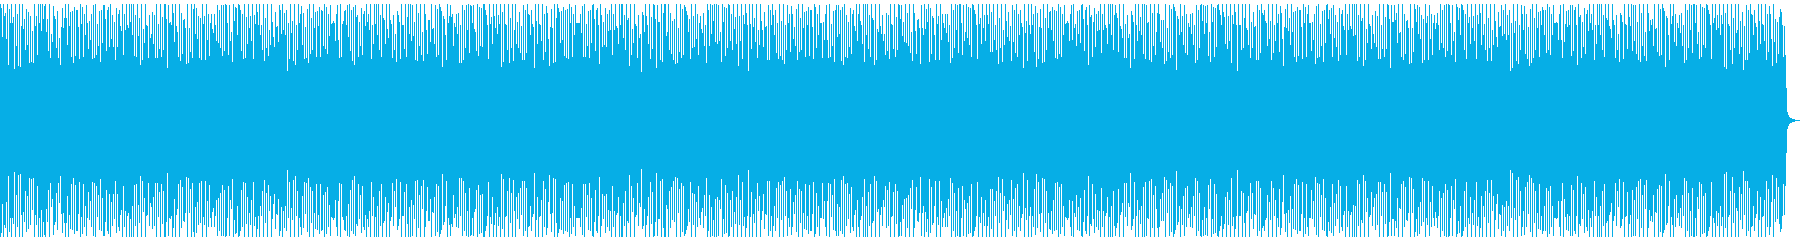 Corporate VP Notice, Simple, Cute:L's reproduced waveform